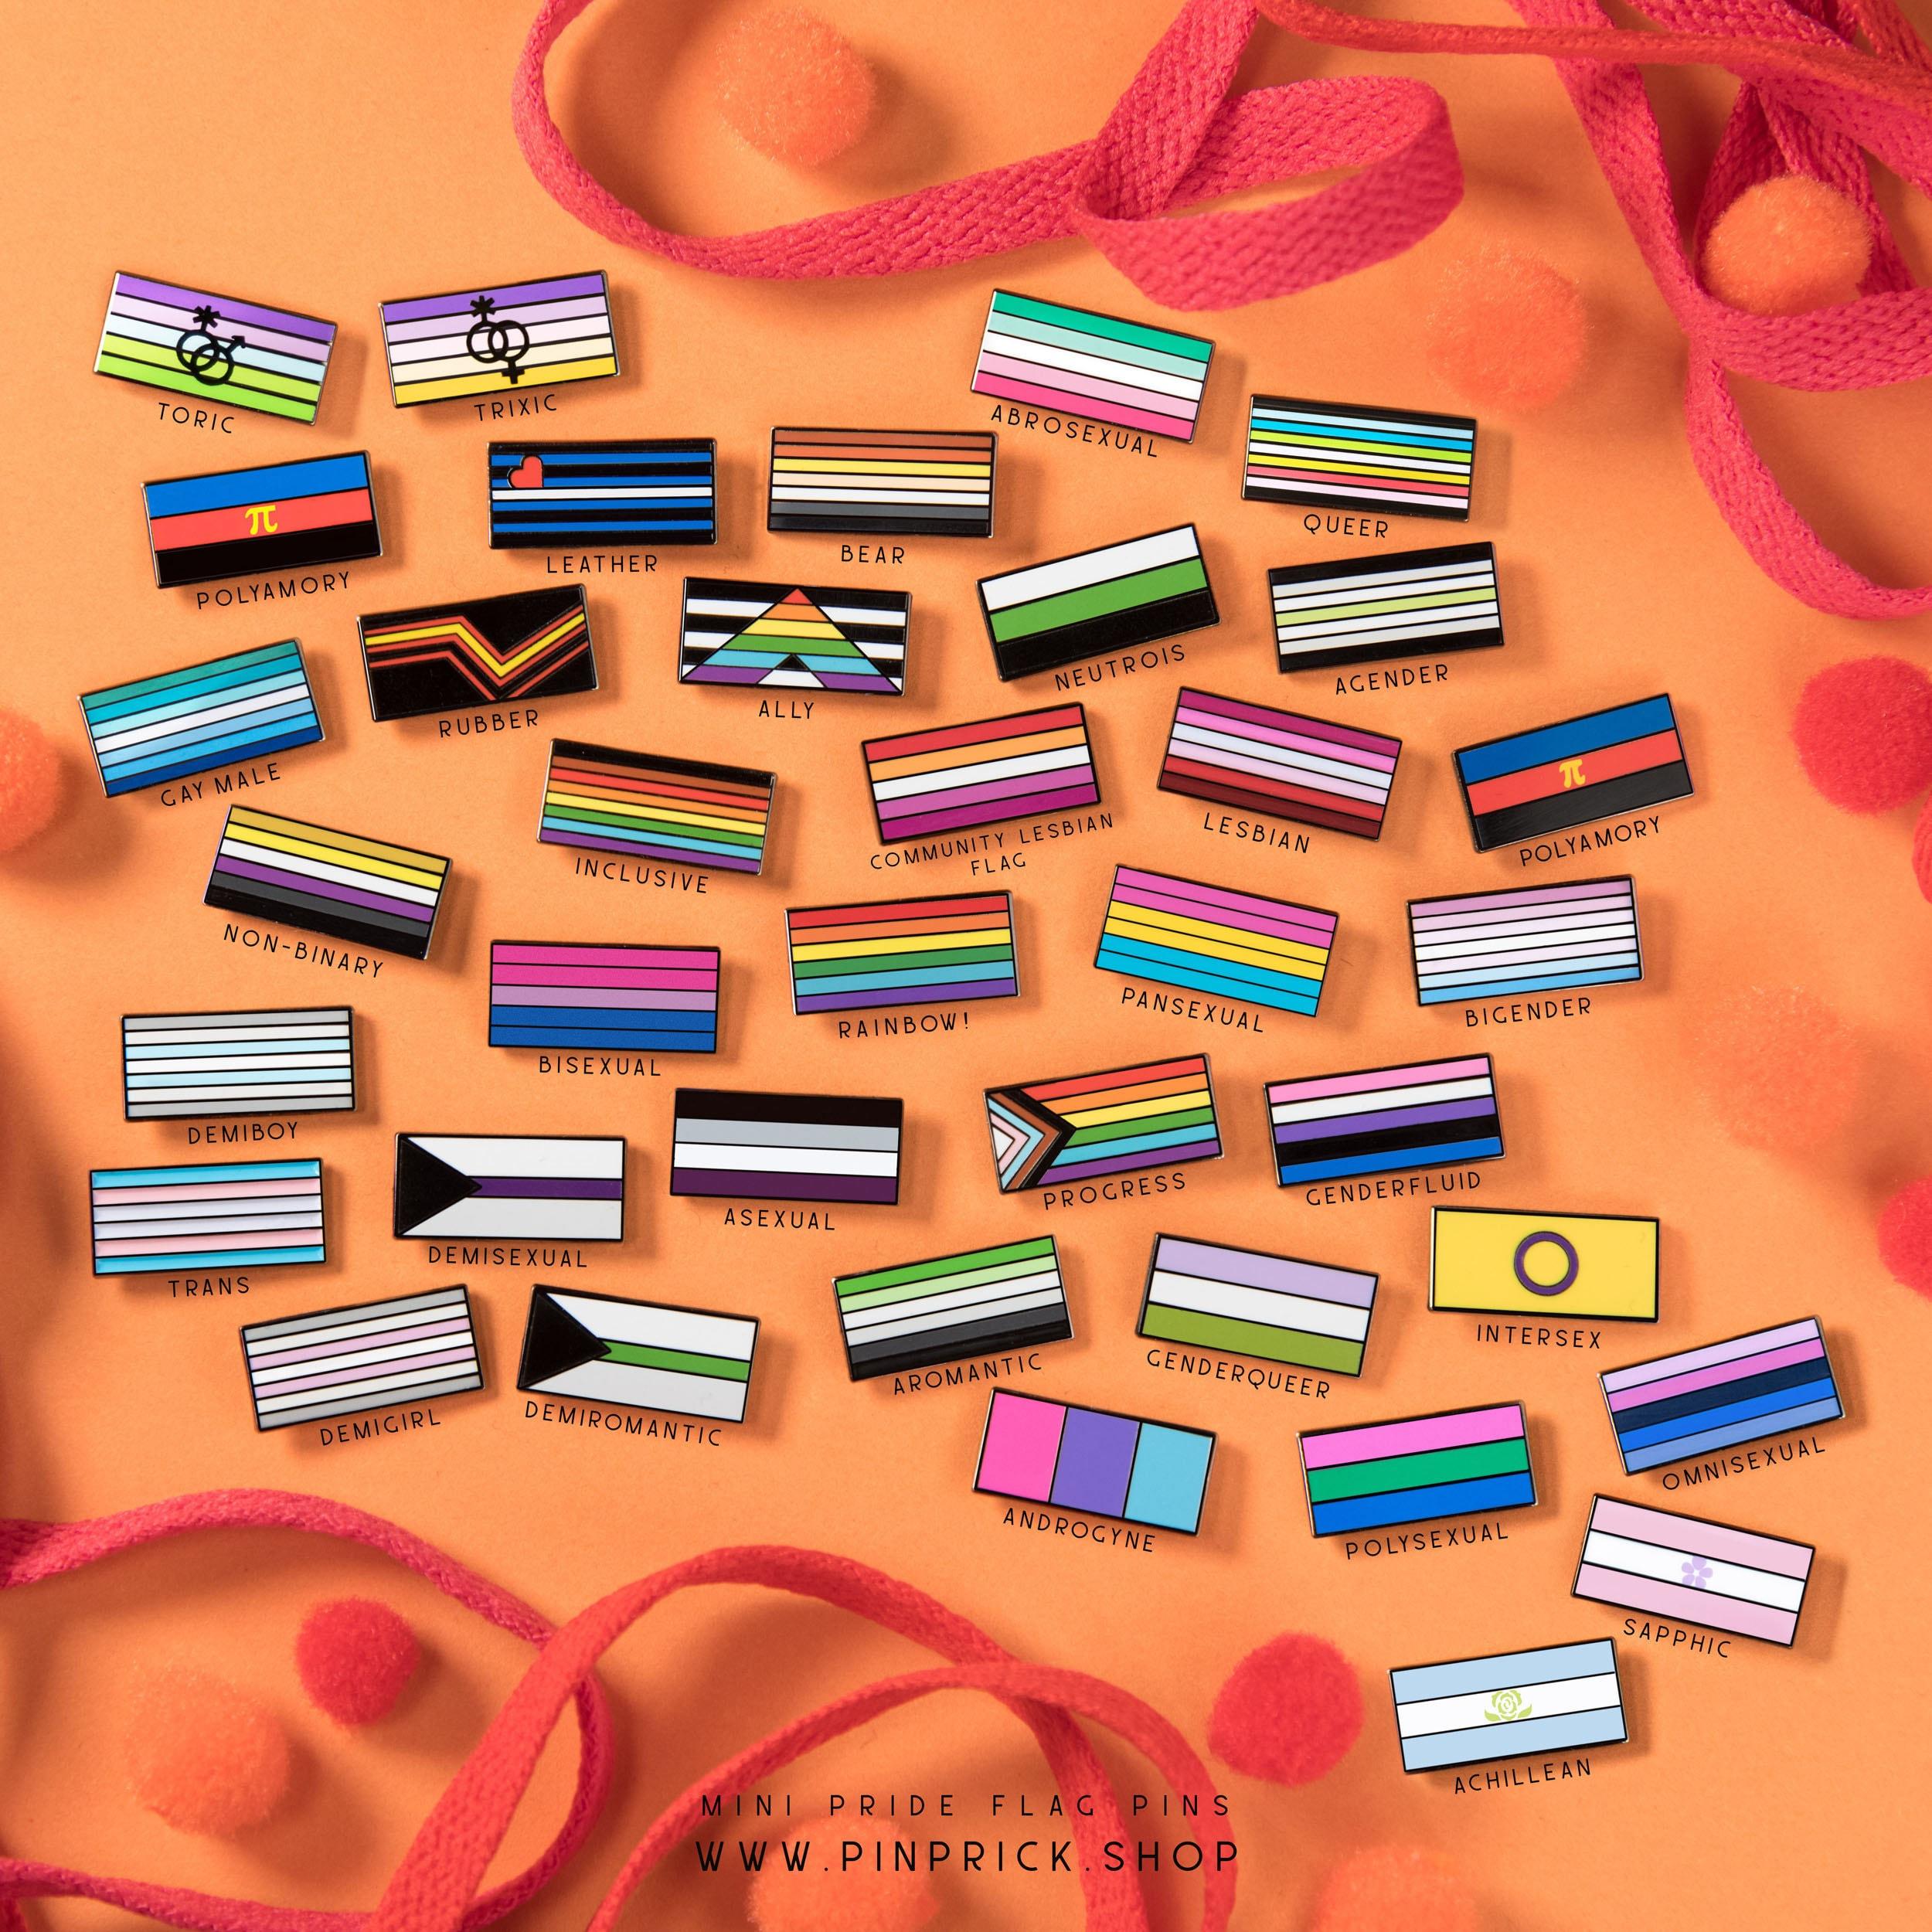 Subtle Minimalist Rainbow Gay Pride Flag Pins Pinprick Enamel Pride Accessories Christmas